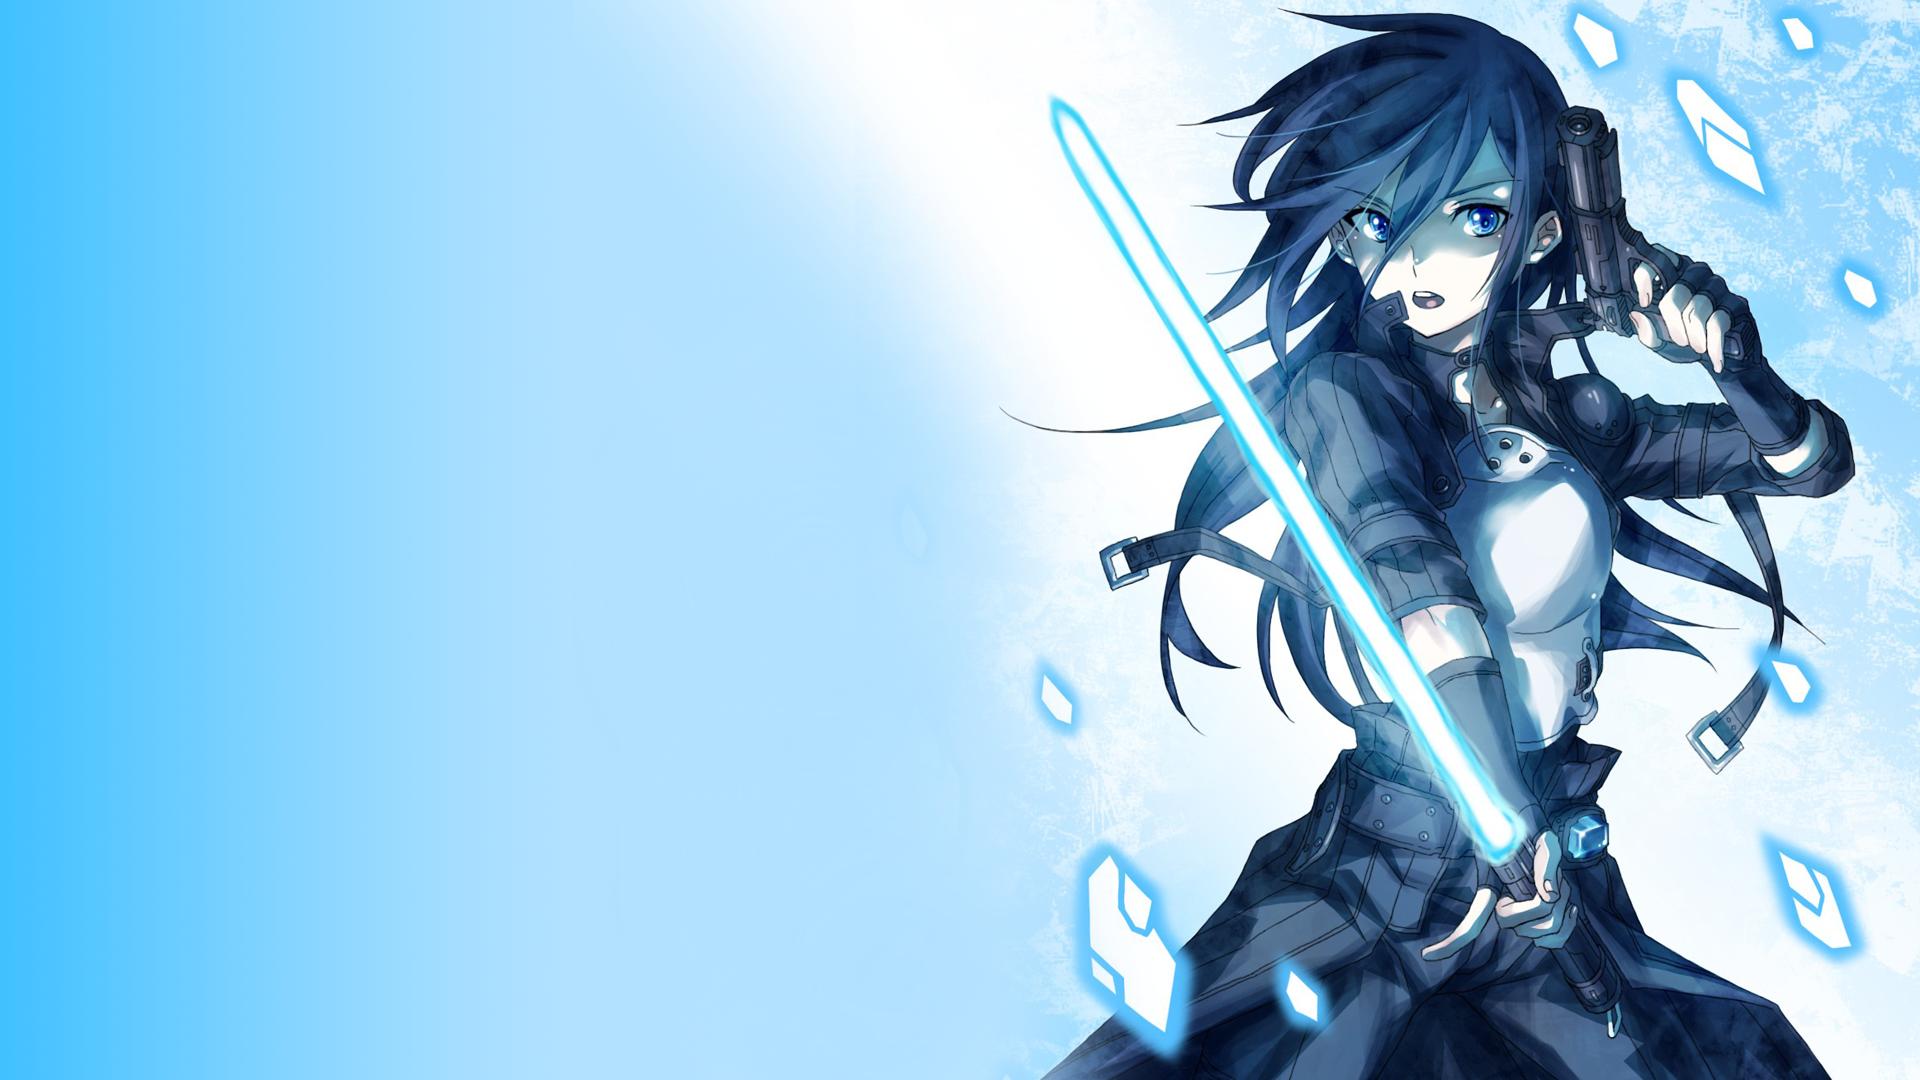 tags anime blue sao image resolution x wallpaper with ImgStockscom 1920x1080